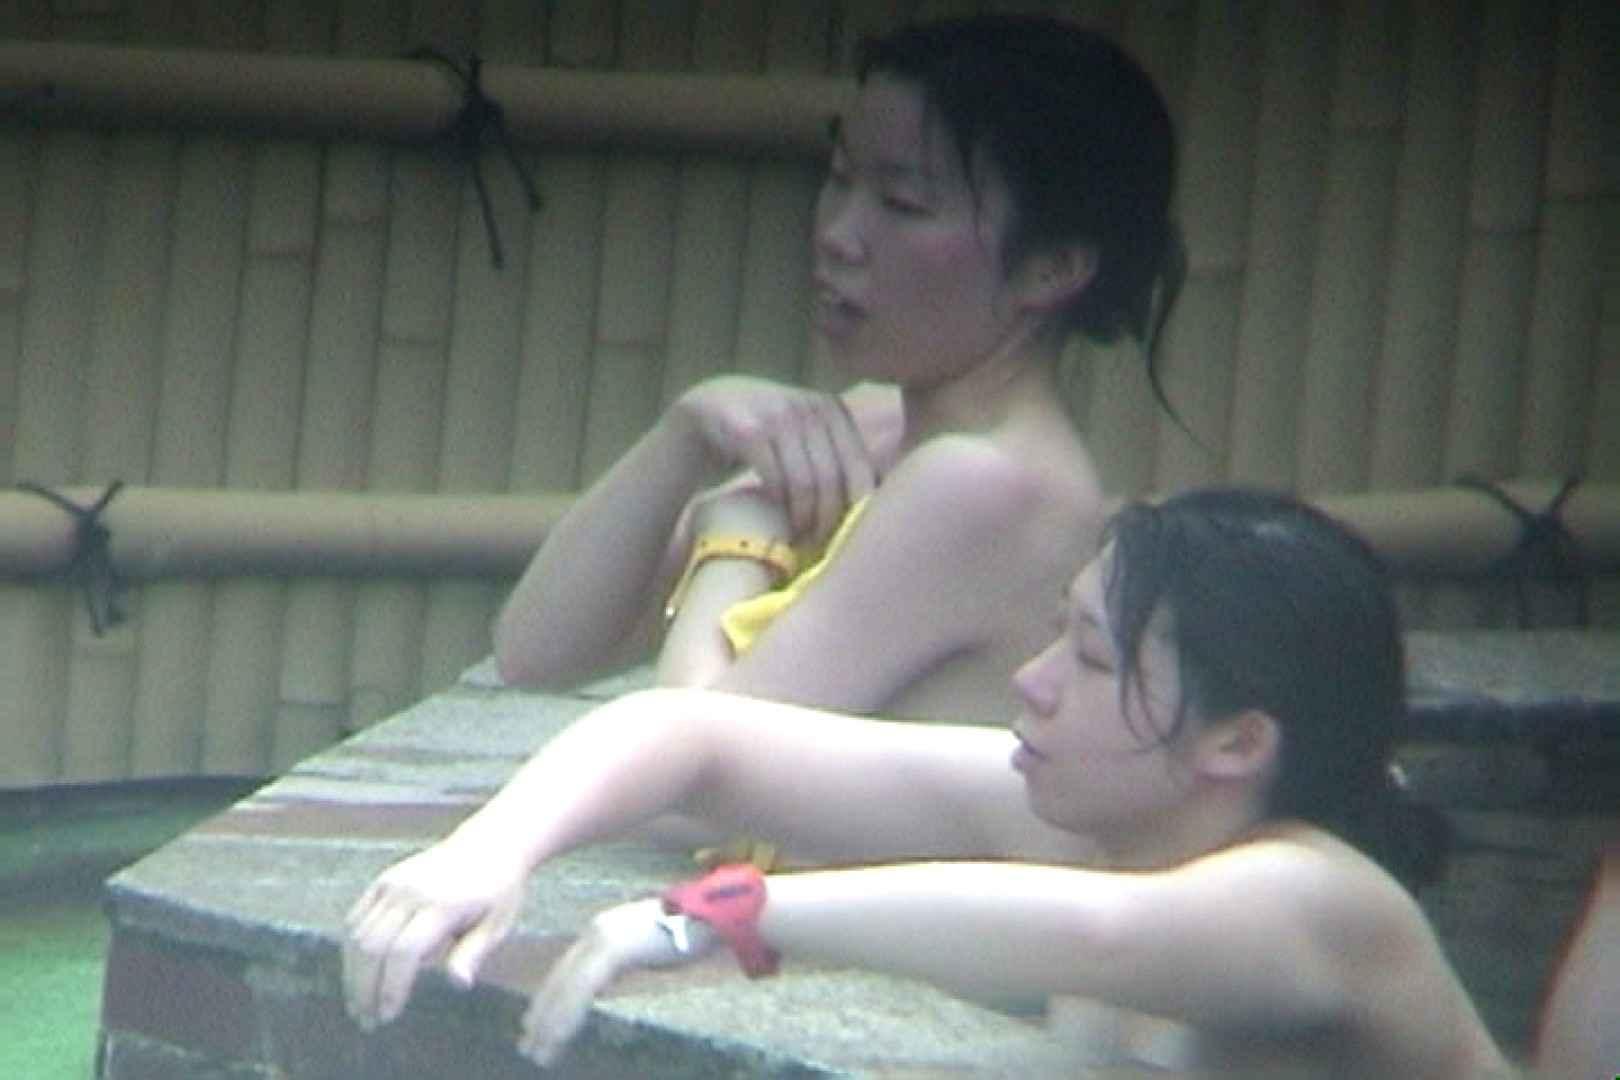 Aquaな露天風呂Vol.105 露天風呂突入 おめこ無修正動画無料 69pic 8